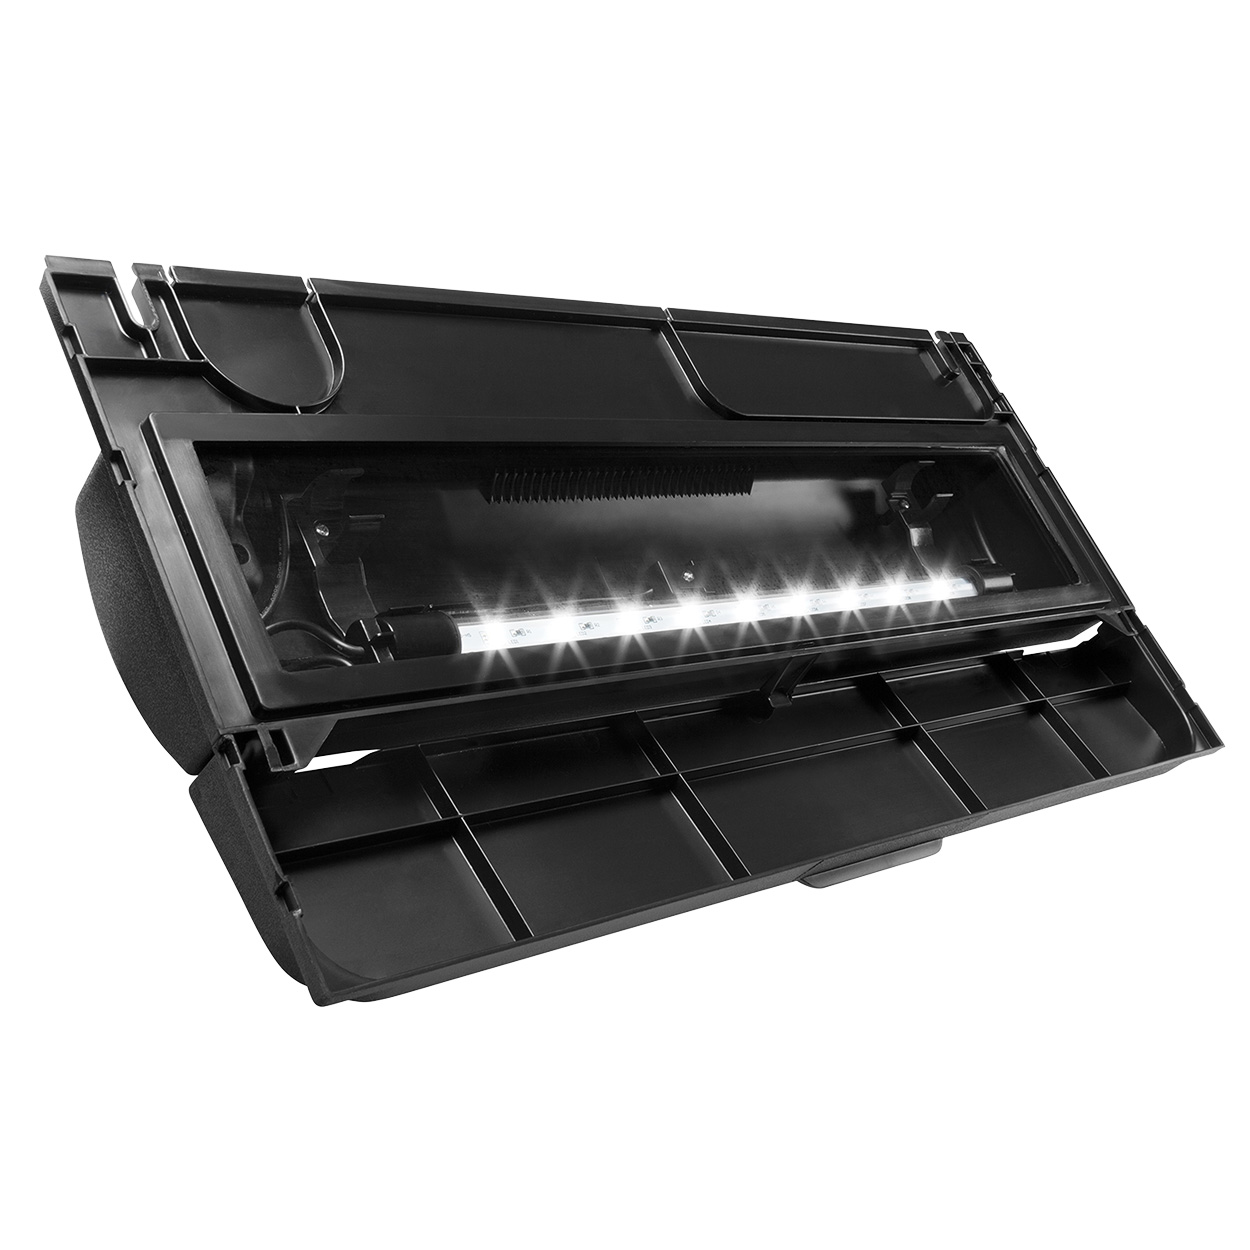 "Aqueon Deluxe LED Full Hood - Black - 24"" 22641"